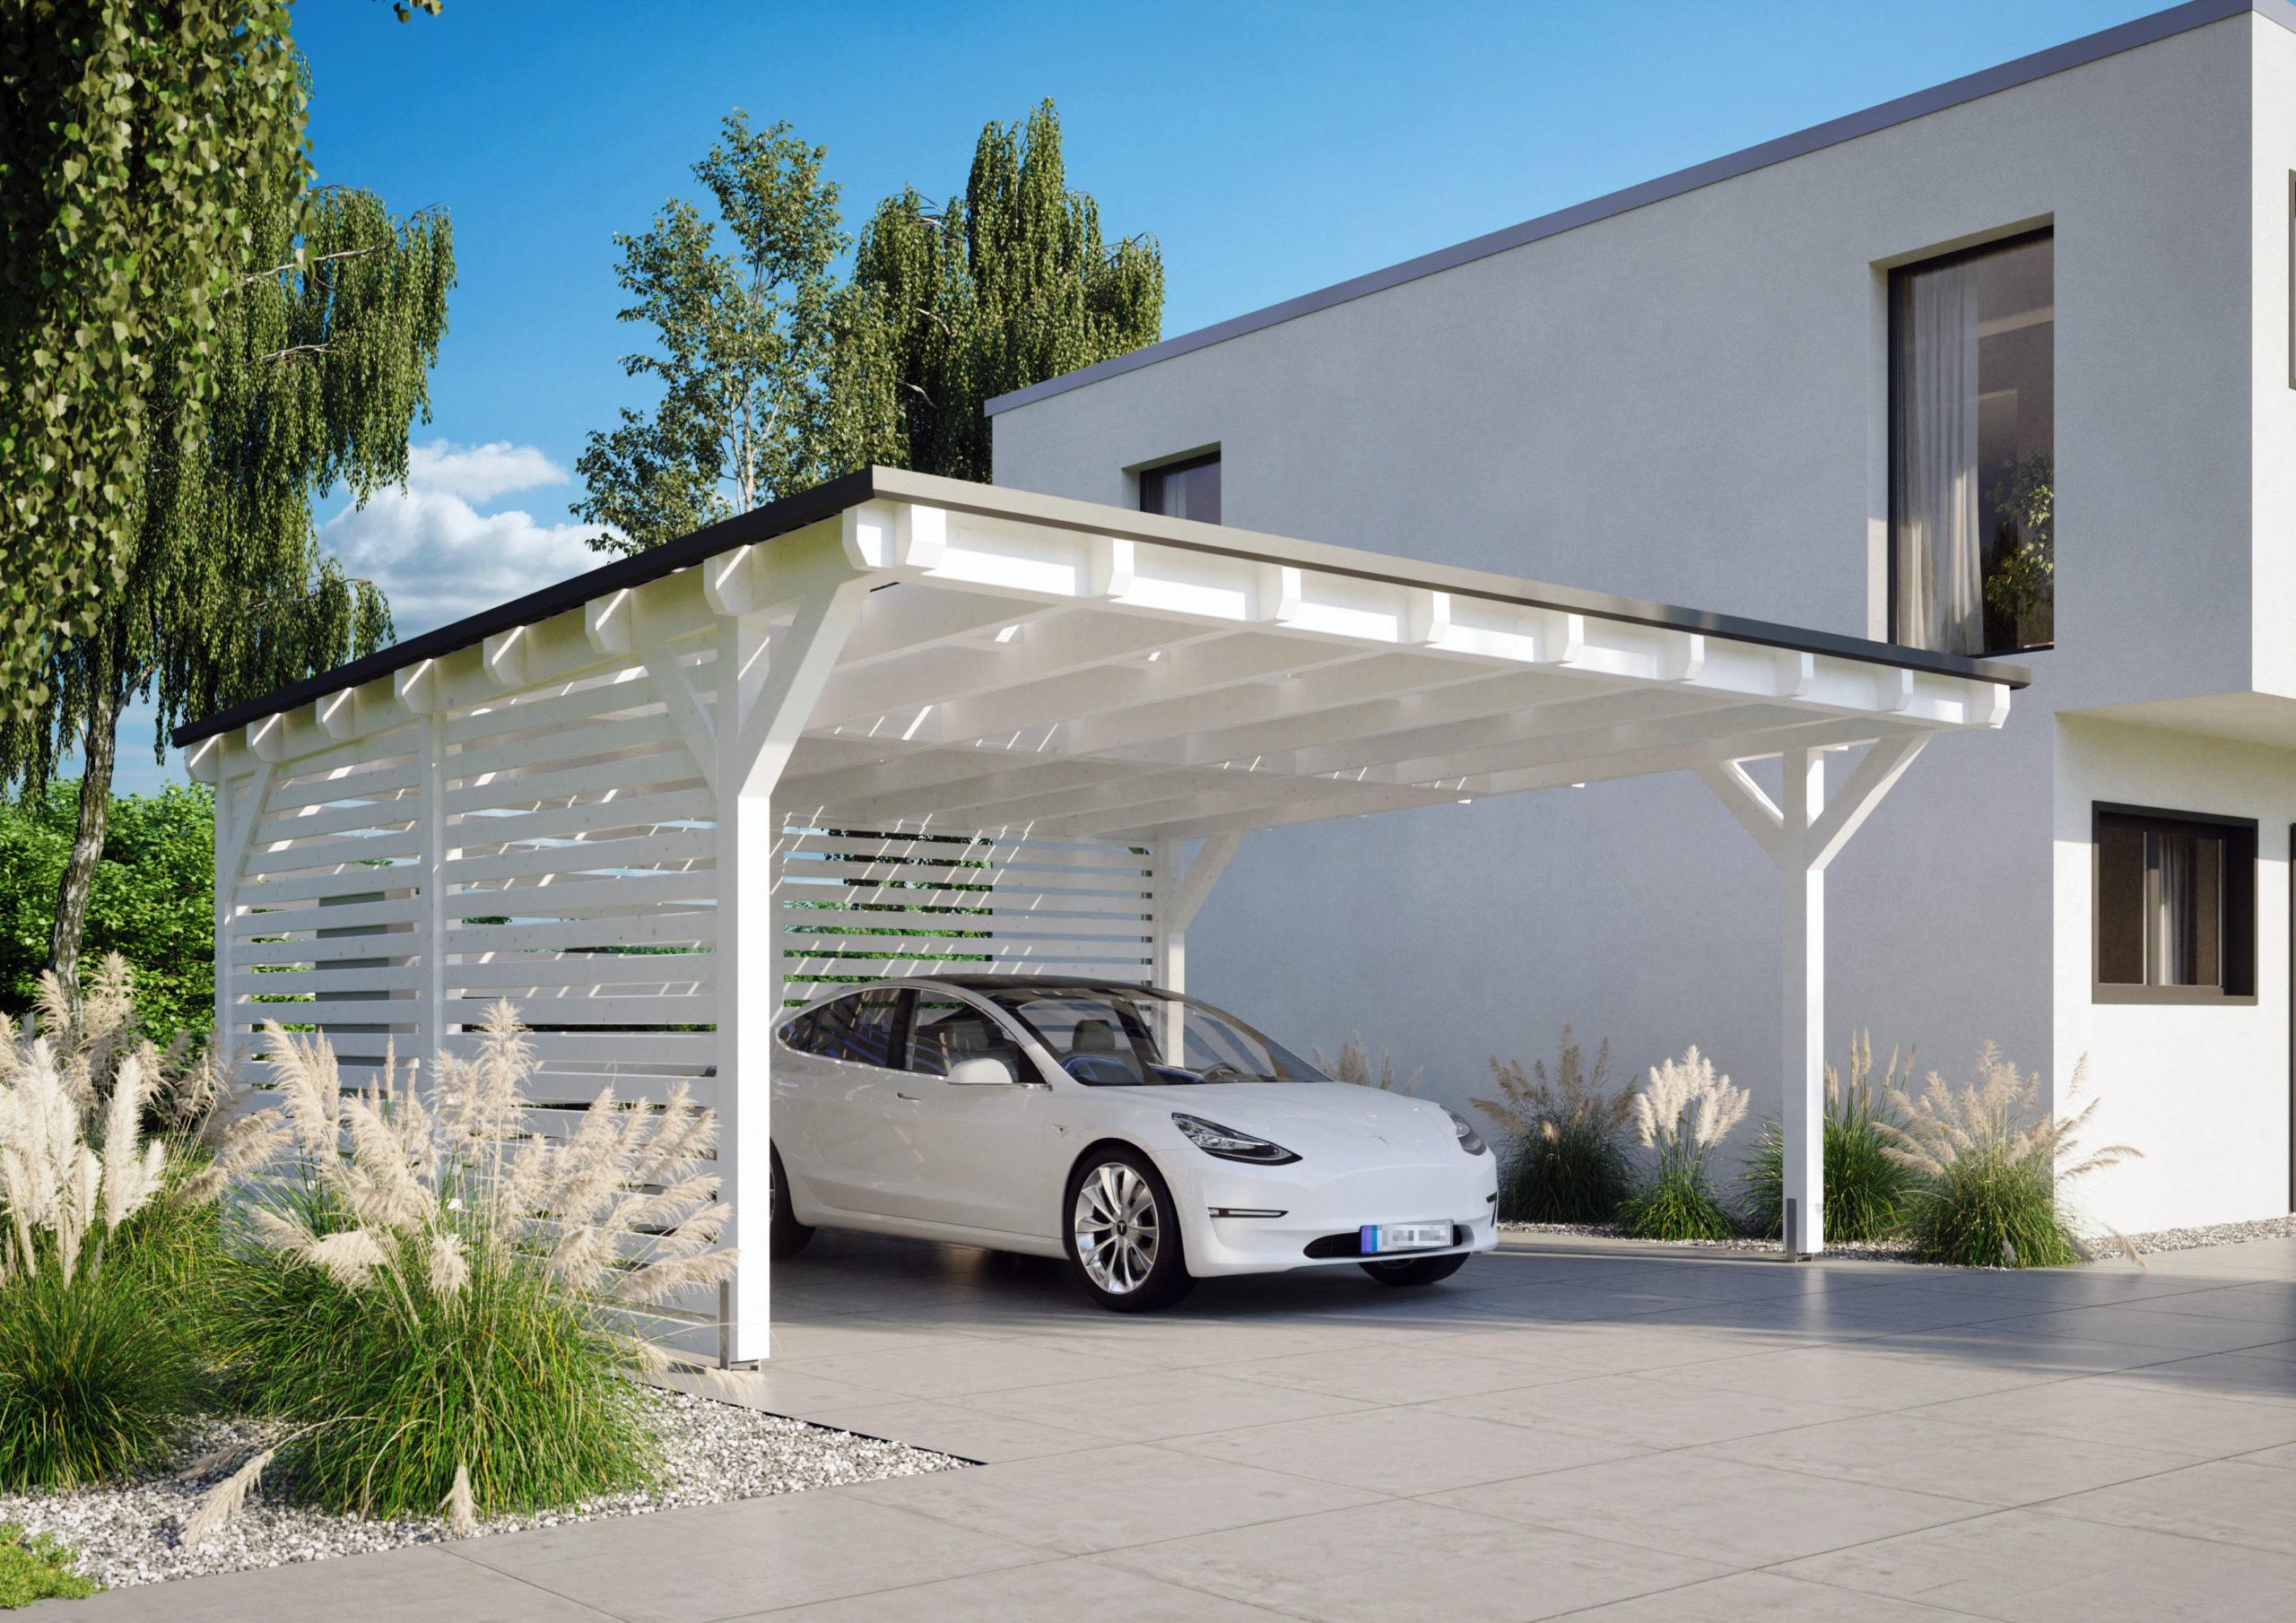 Carport mit Solardach